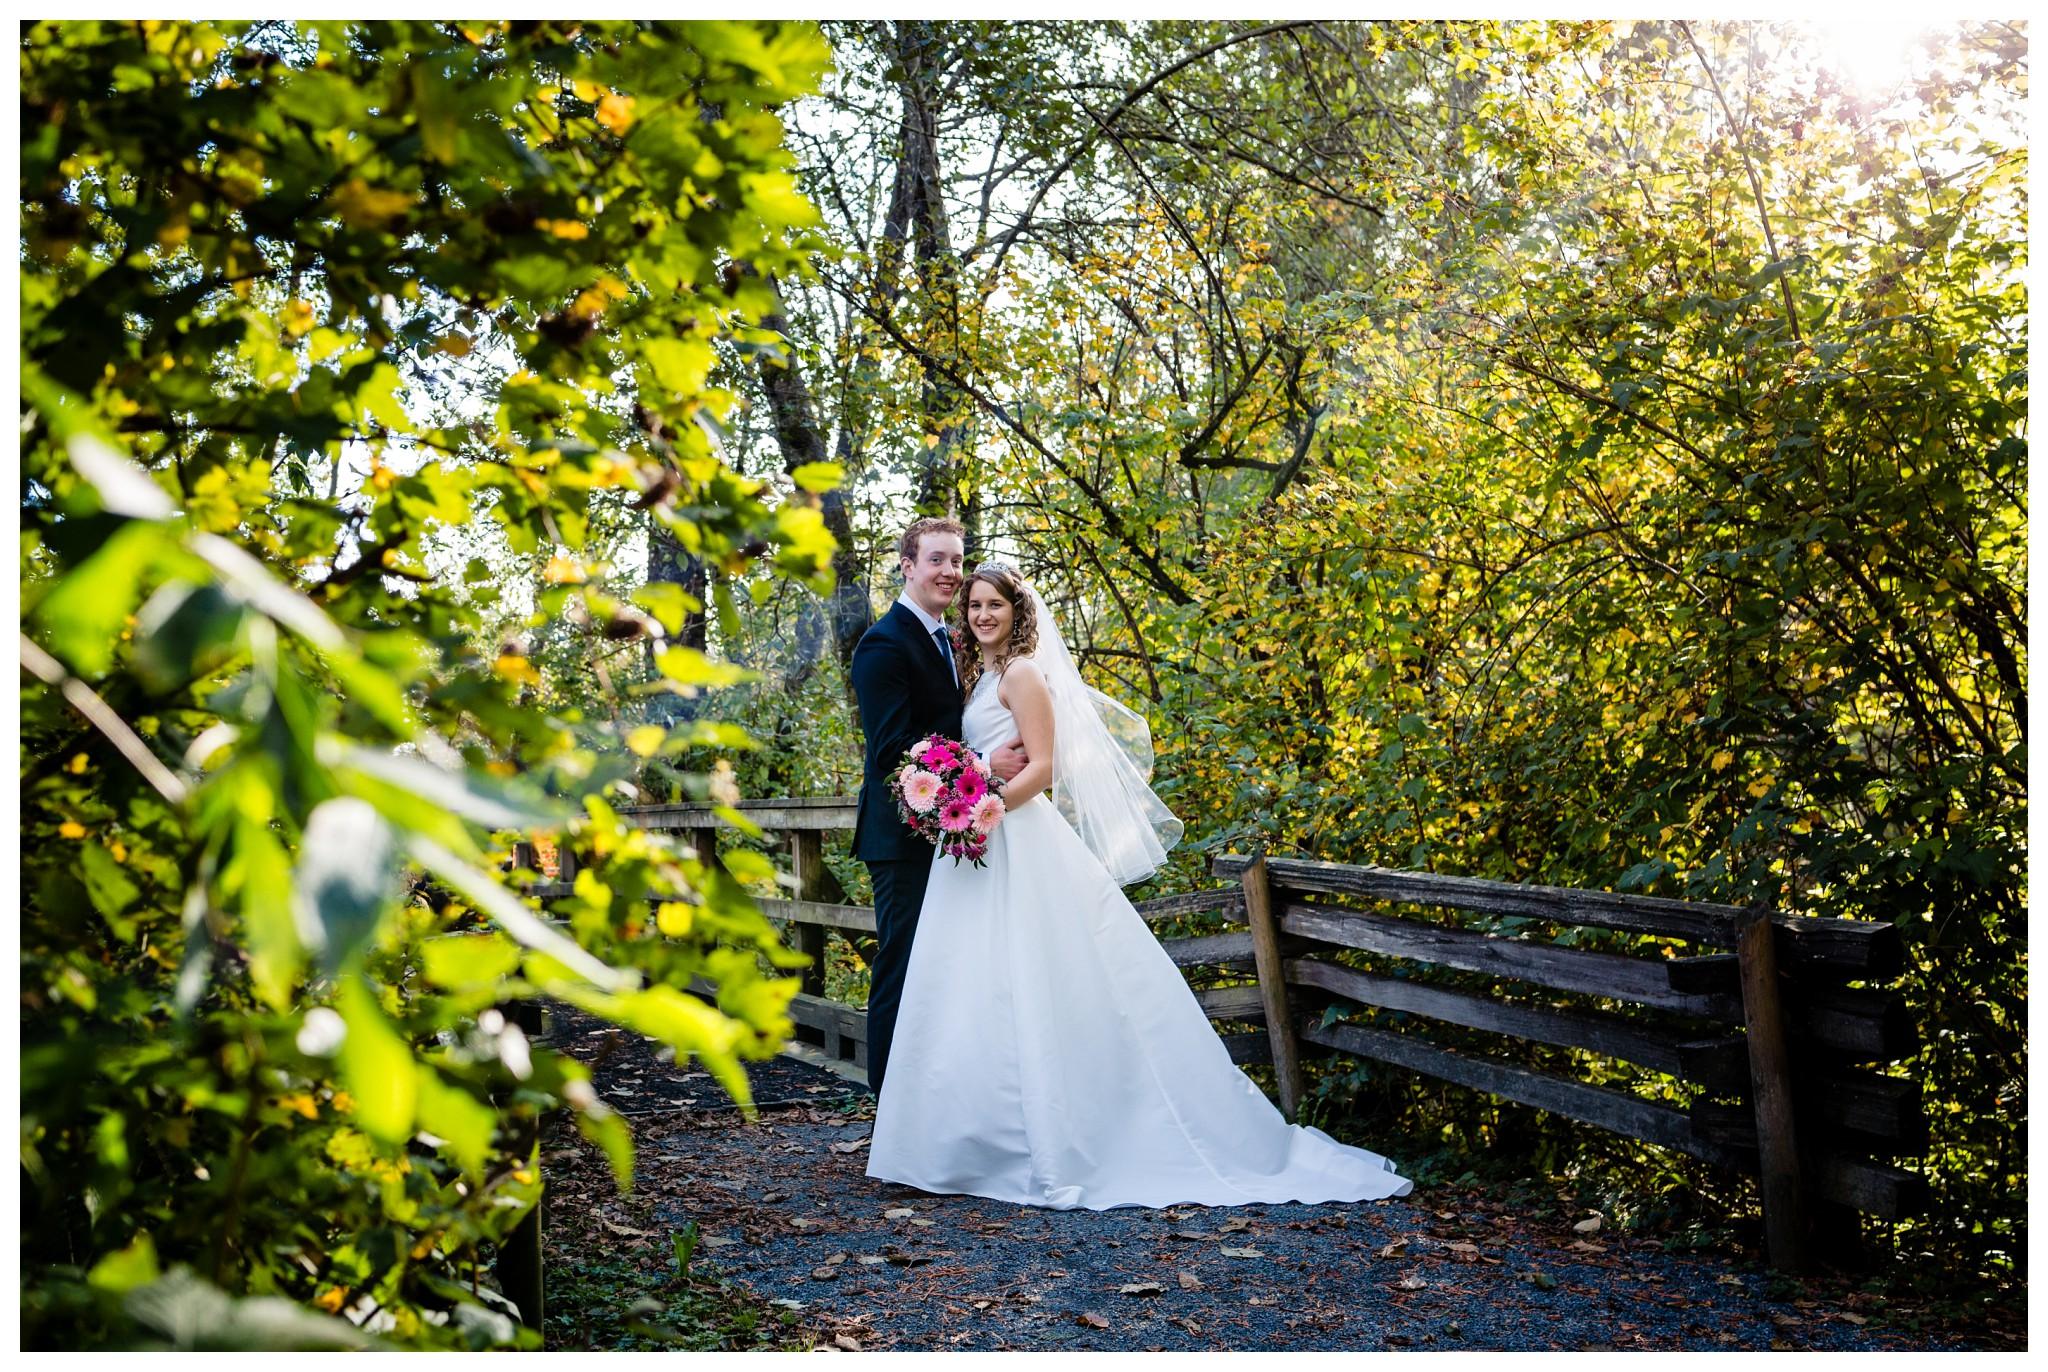 Aldergrove Park Christian Church Wedding Photography Pink Flowers Blue Bridesmaid Dress Fall_0101.jpg